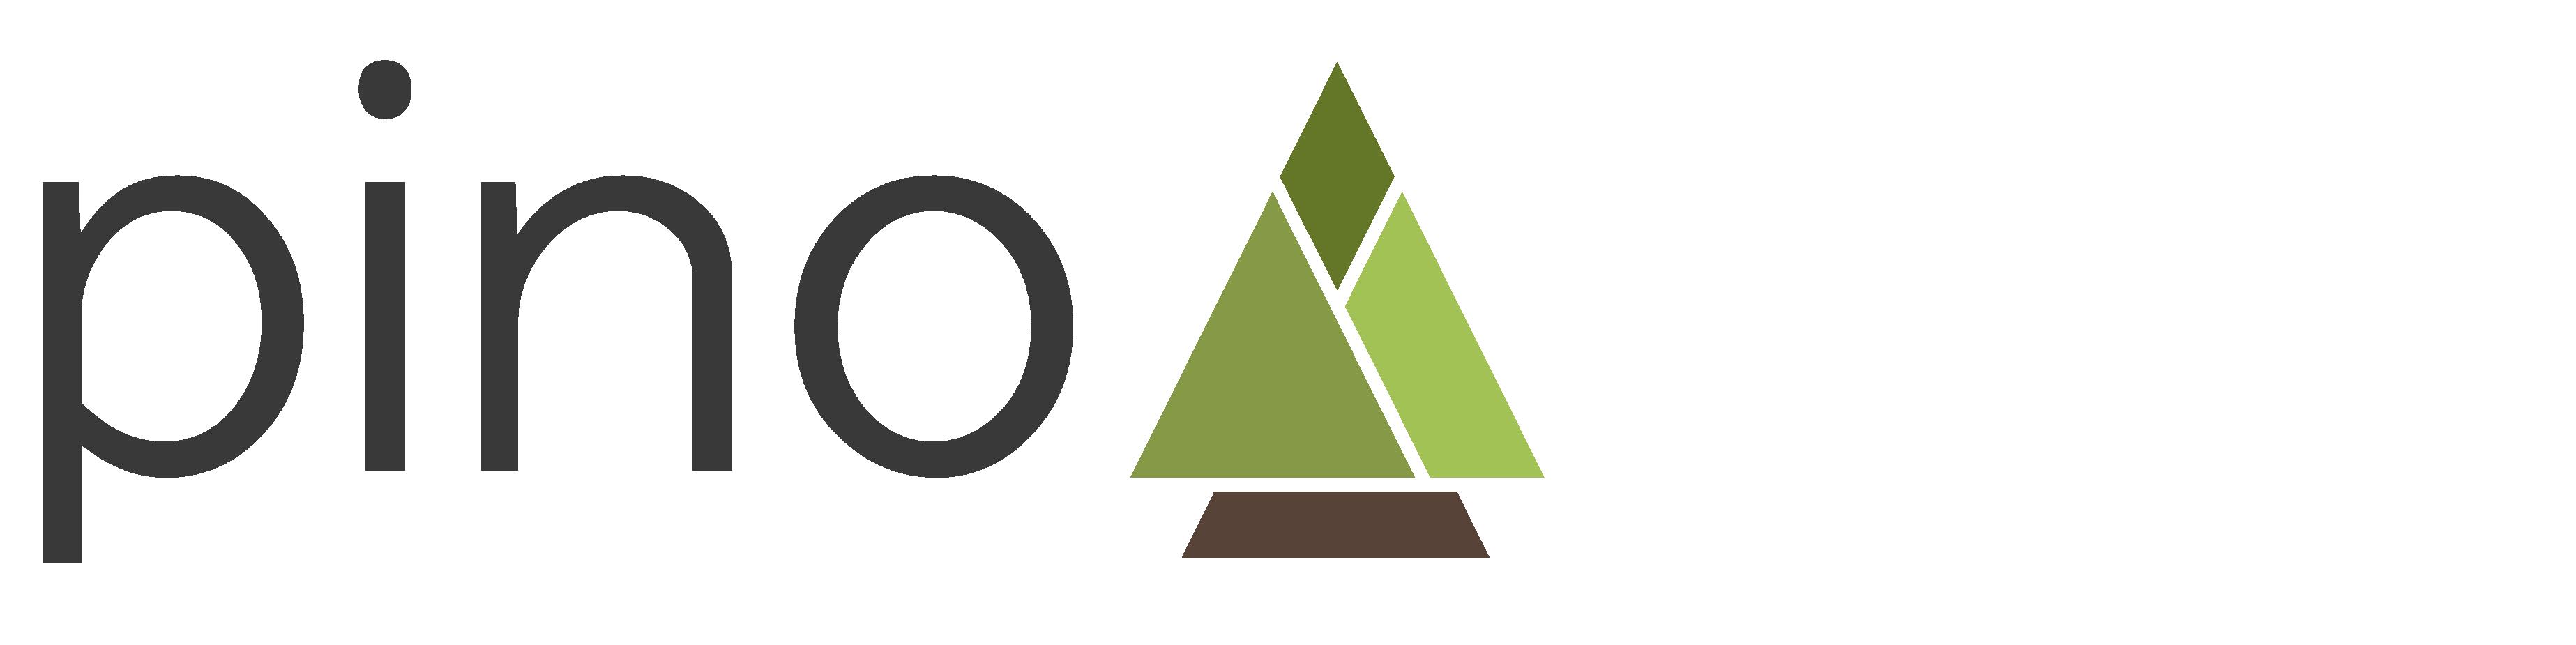 Readme pino super fast. Shell clipart triangle object